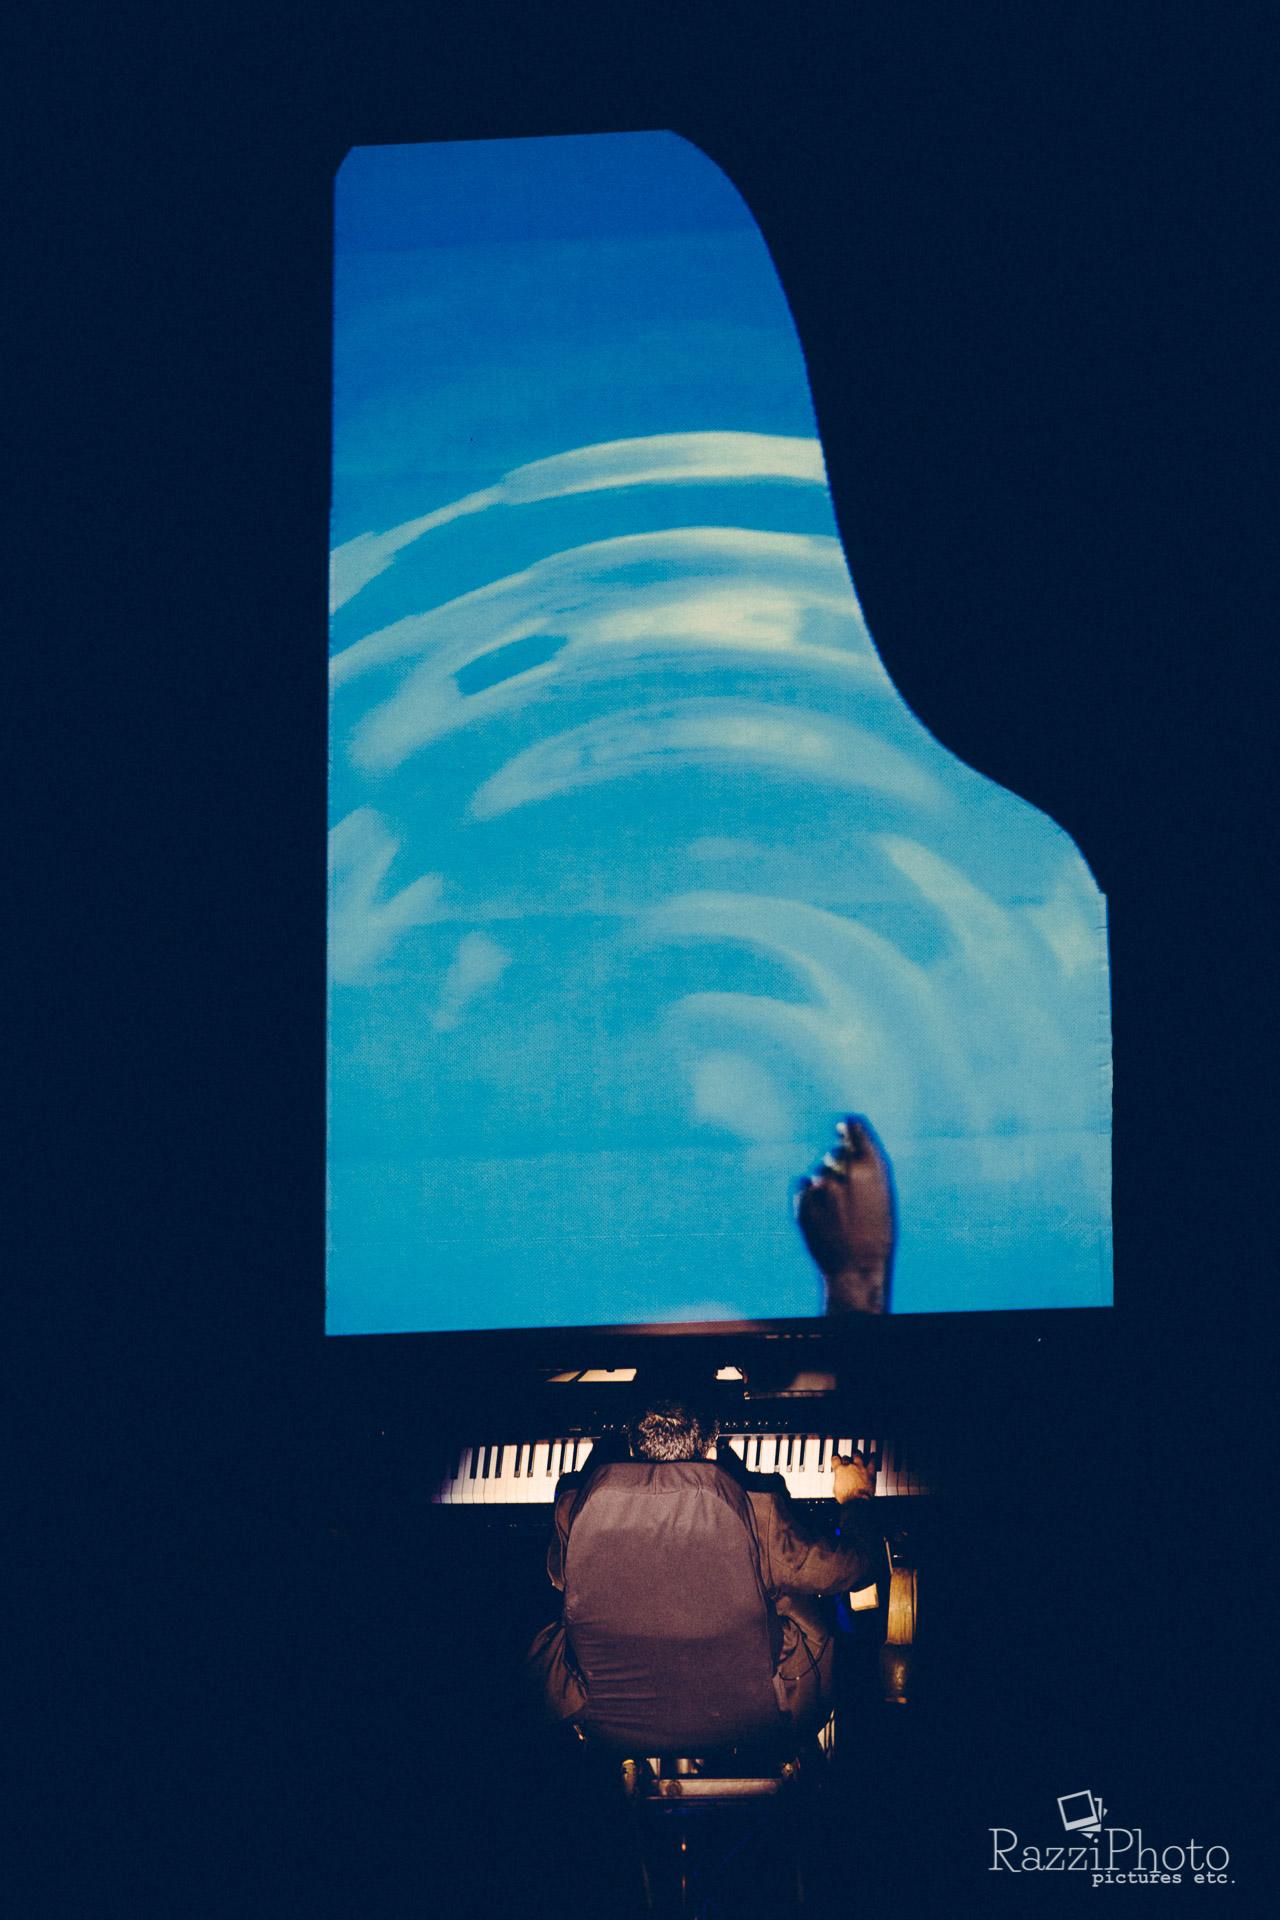 Theater op de Markt 2014: David Moreno - Floten Tecles